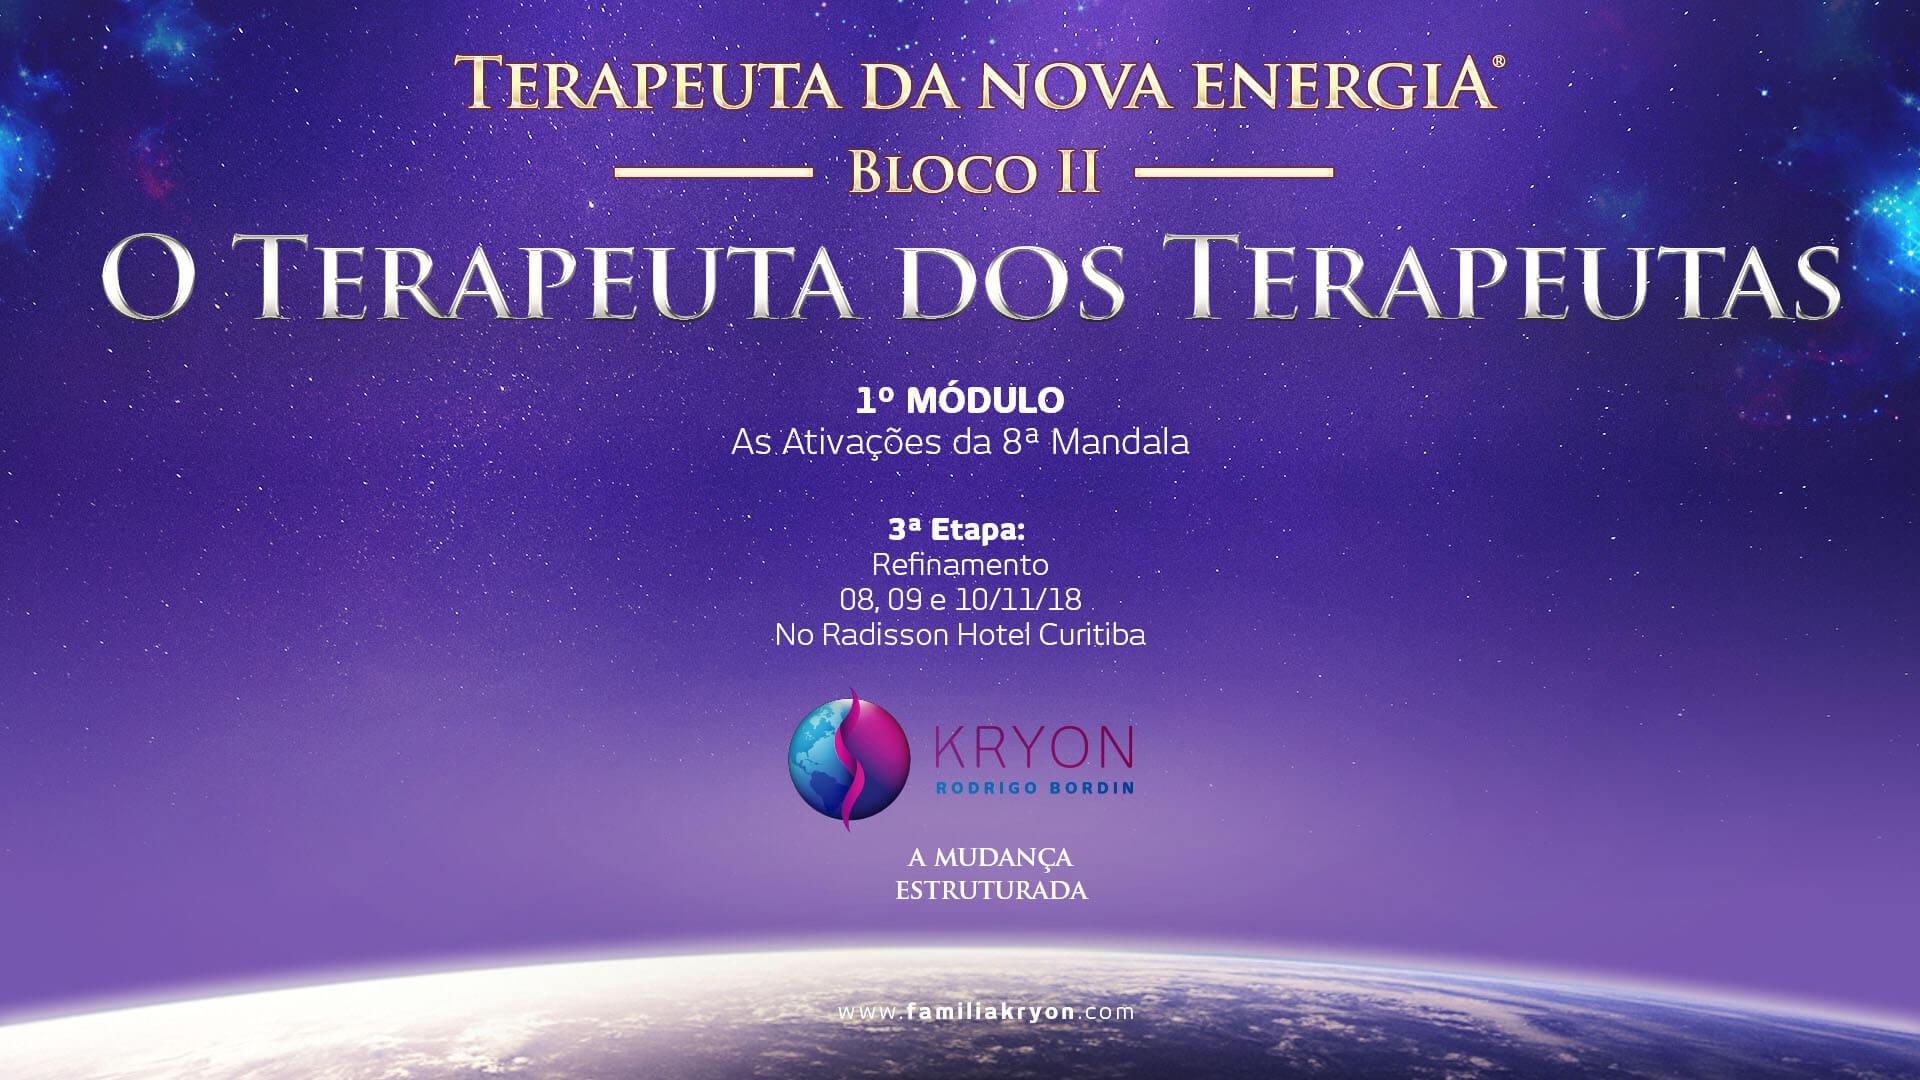 Terapeuta da Nova Energia - Bloco II - 1˚ Módulo - As Ativações da 8˚ Mandala - III Etapa - Refinamento